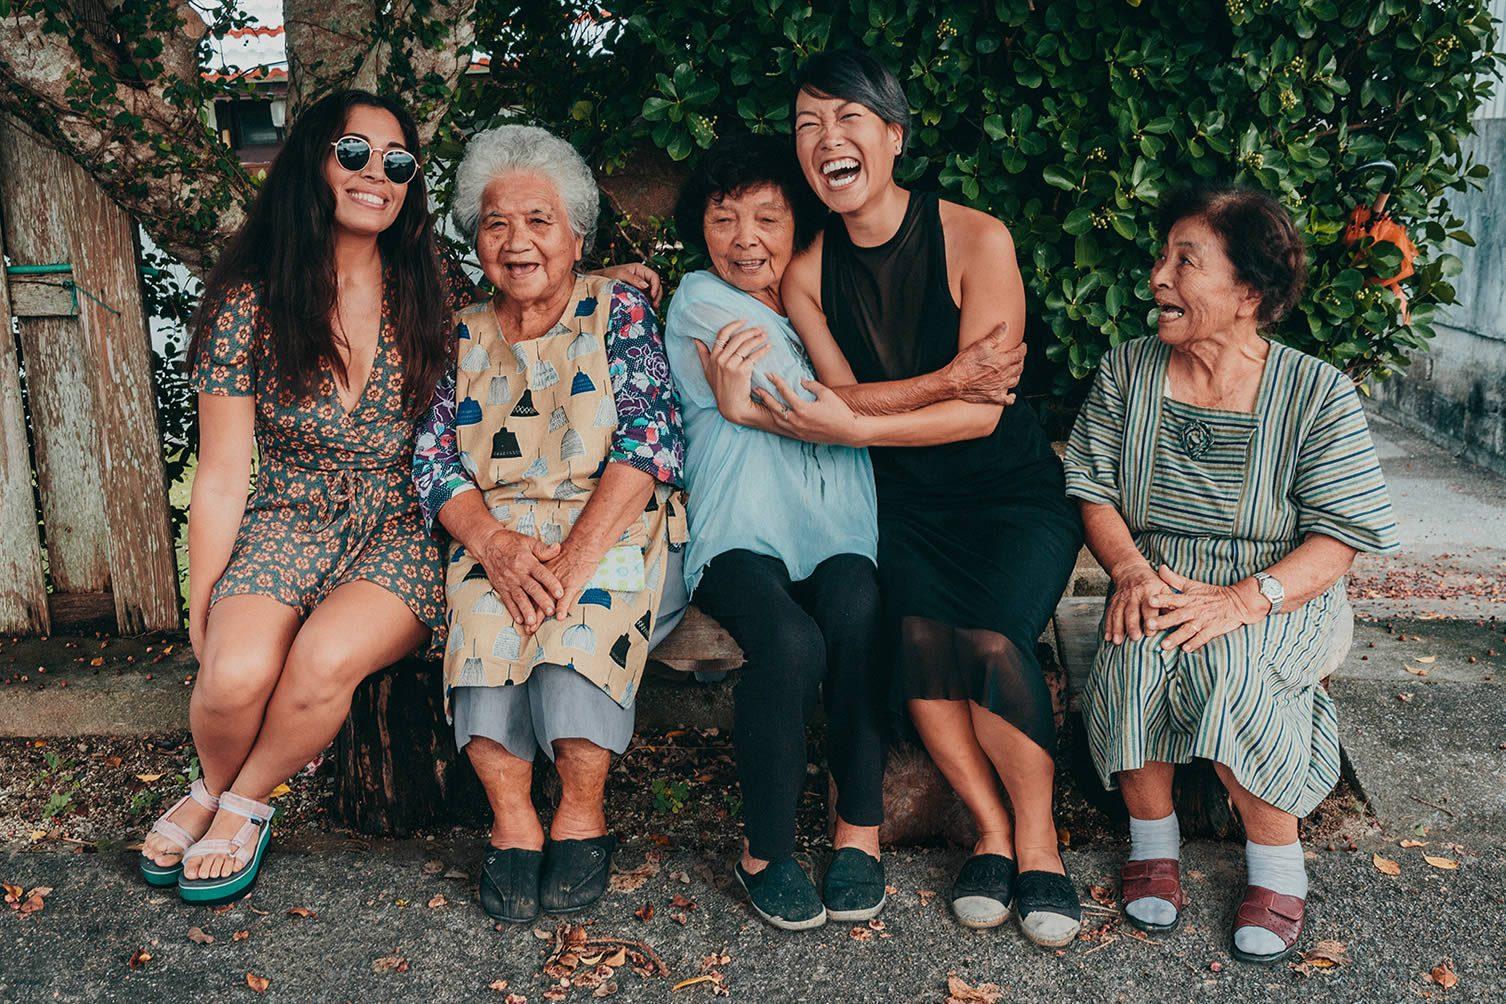 Be. Okinawa. Life, by Okinawa: A Natural Beauty Video